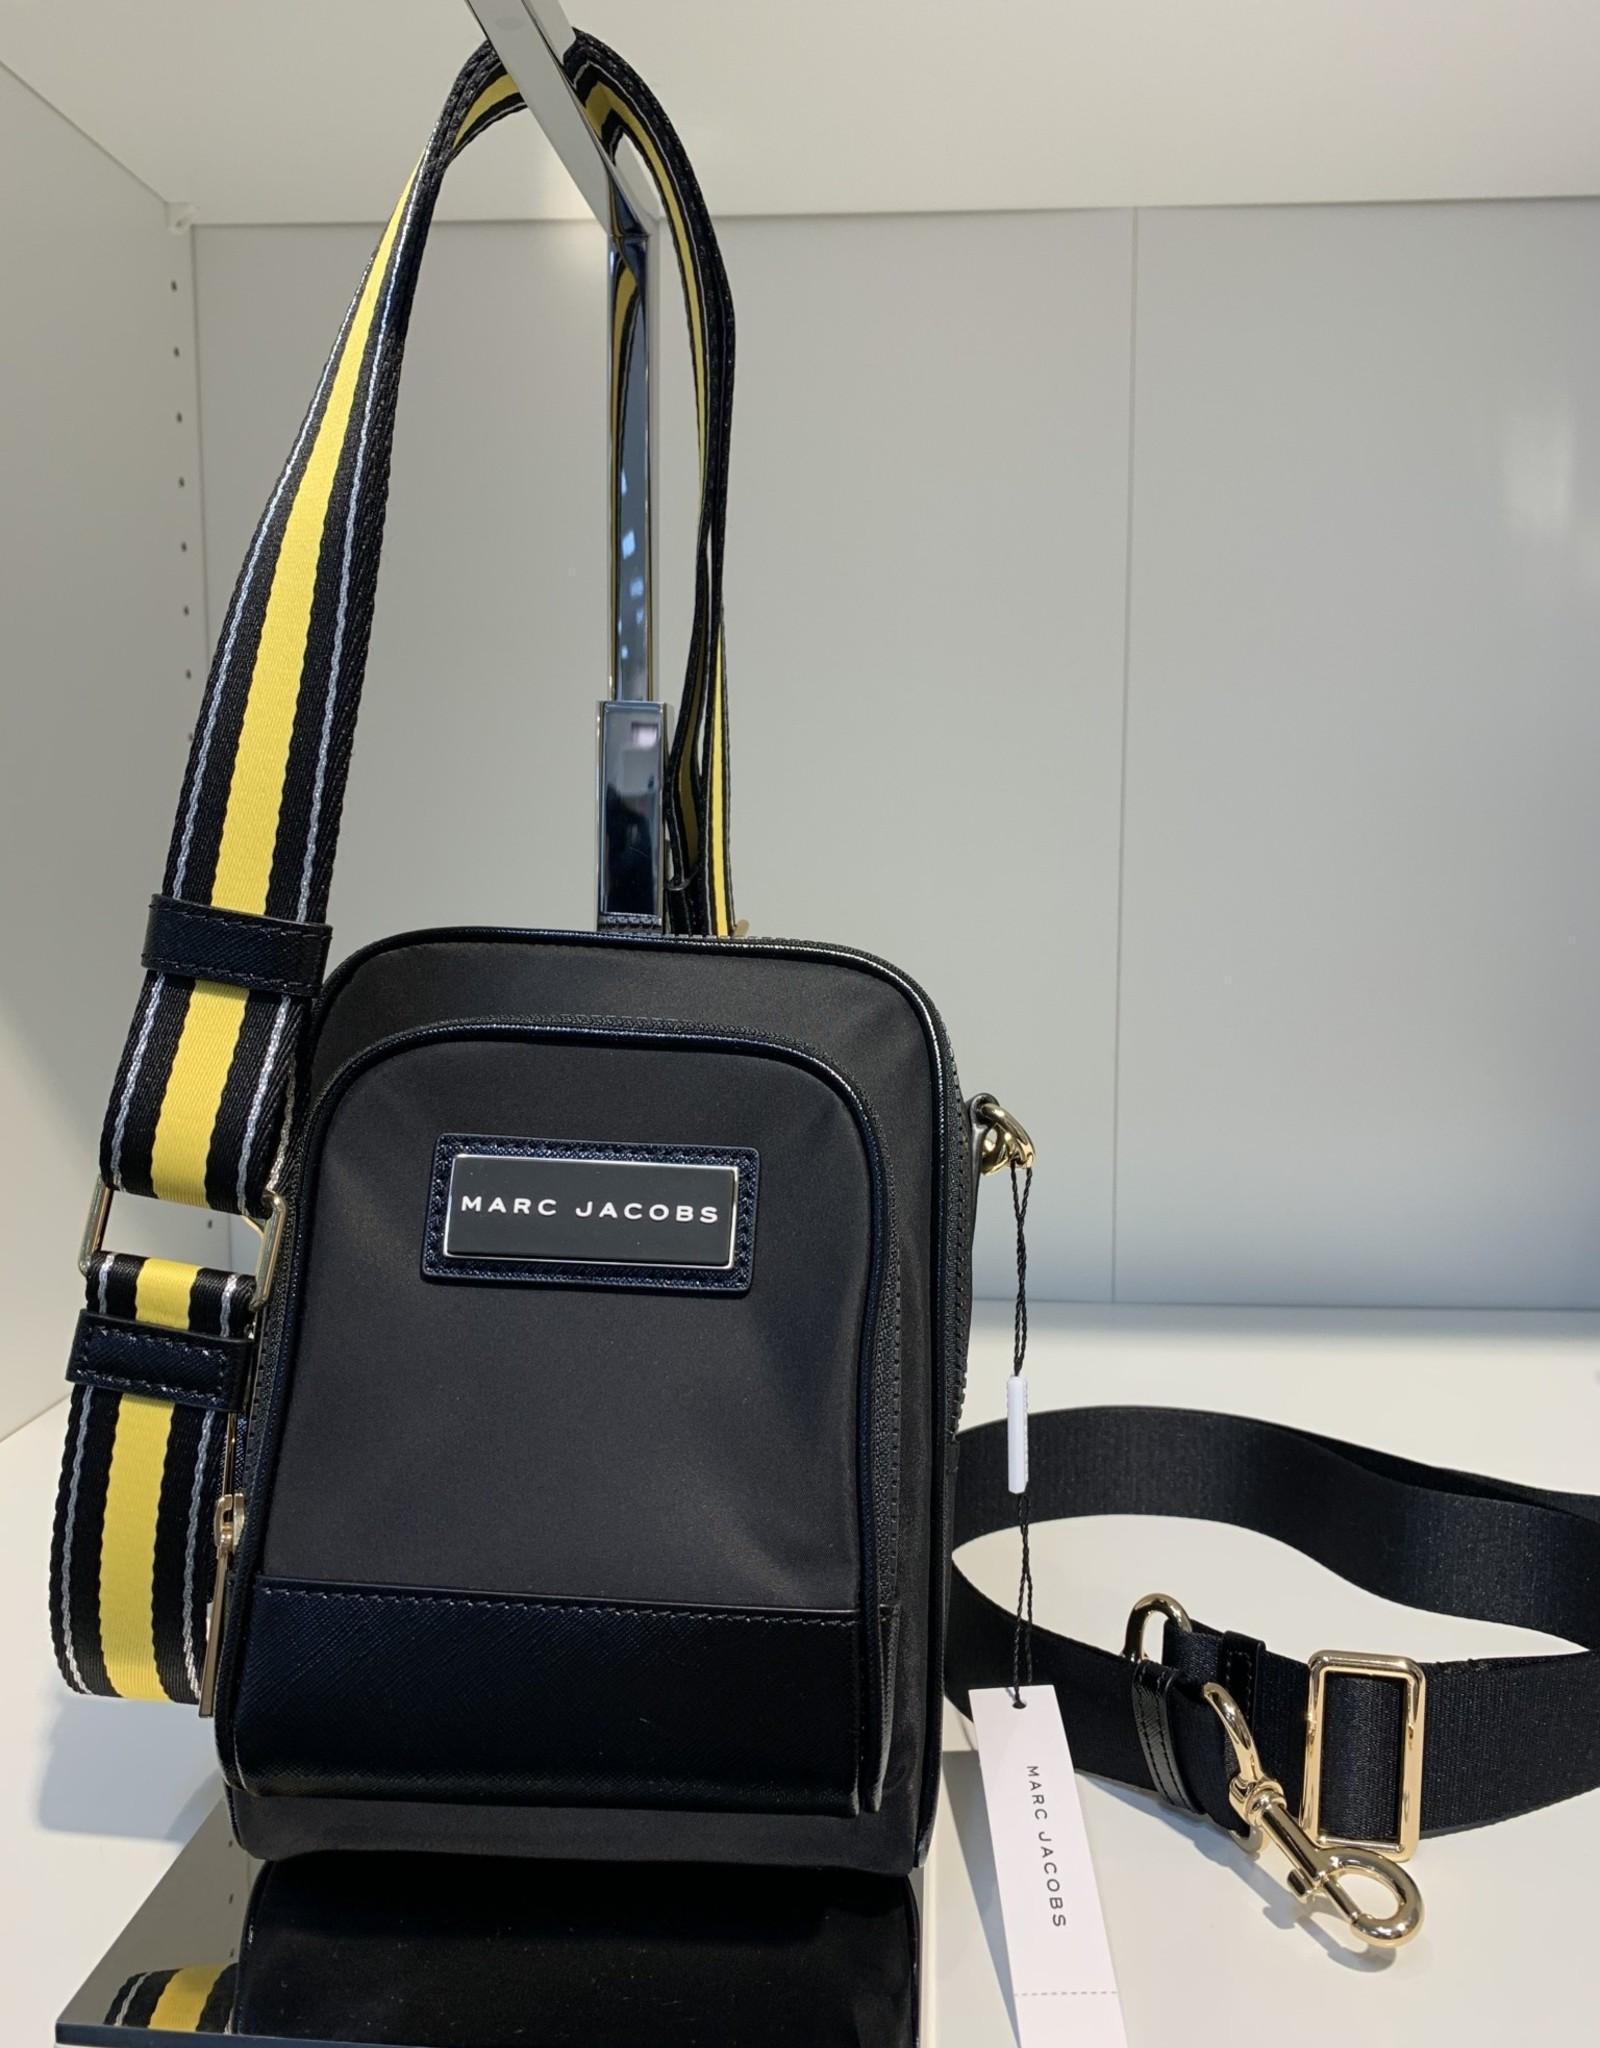 Marc Jacobs Marc Jacobs Mini Crossbody Nylon w/ 2 Compartments + Webbing Strap